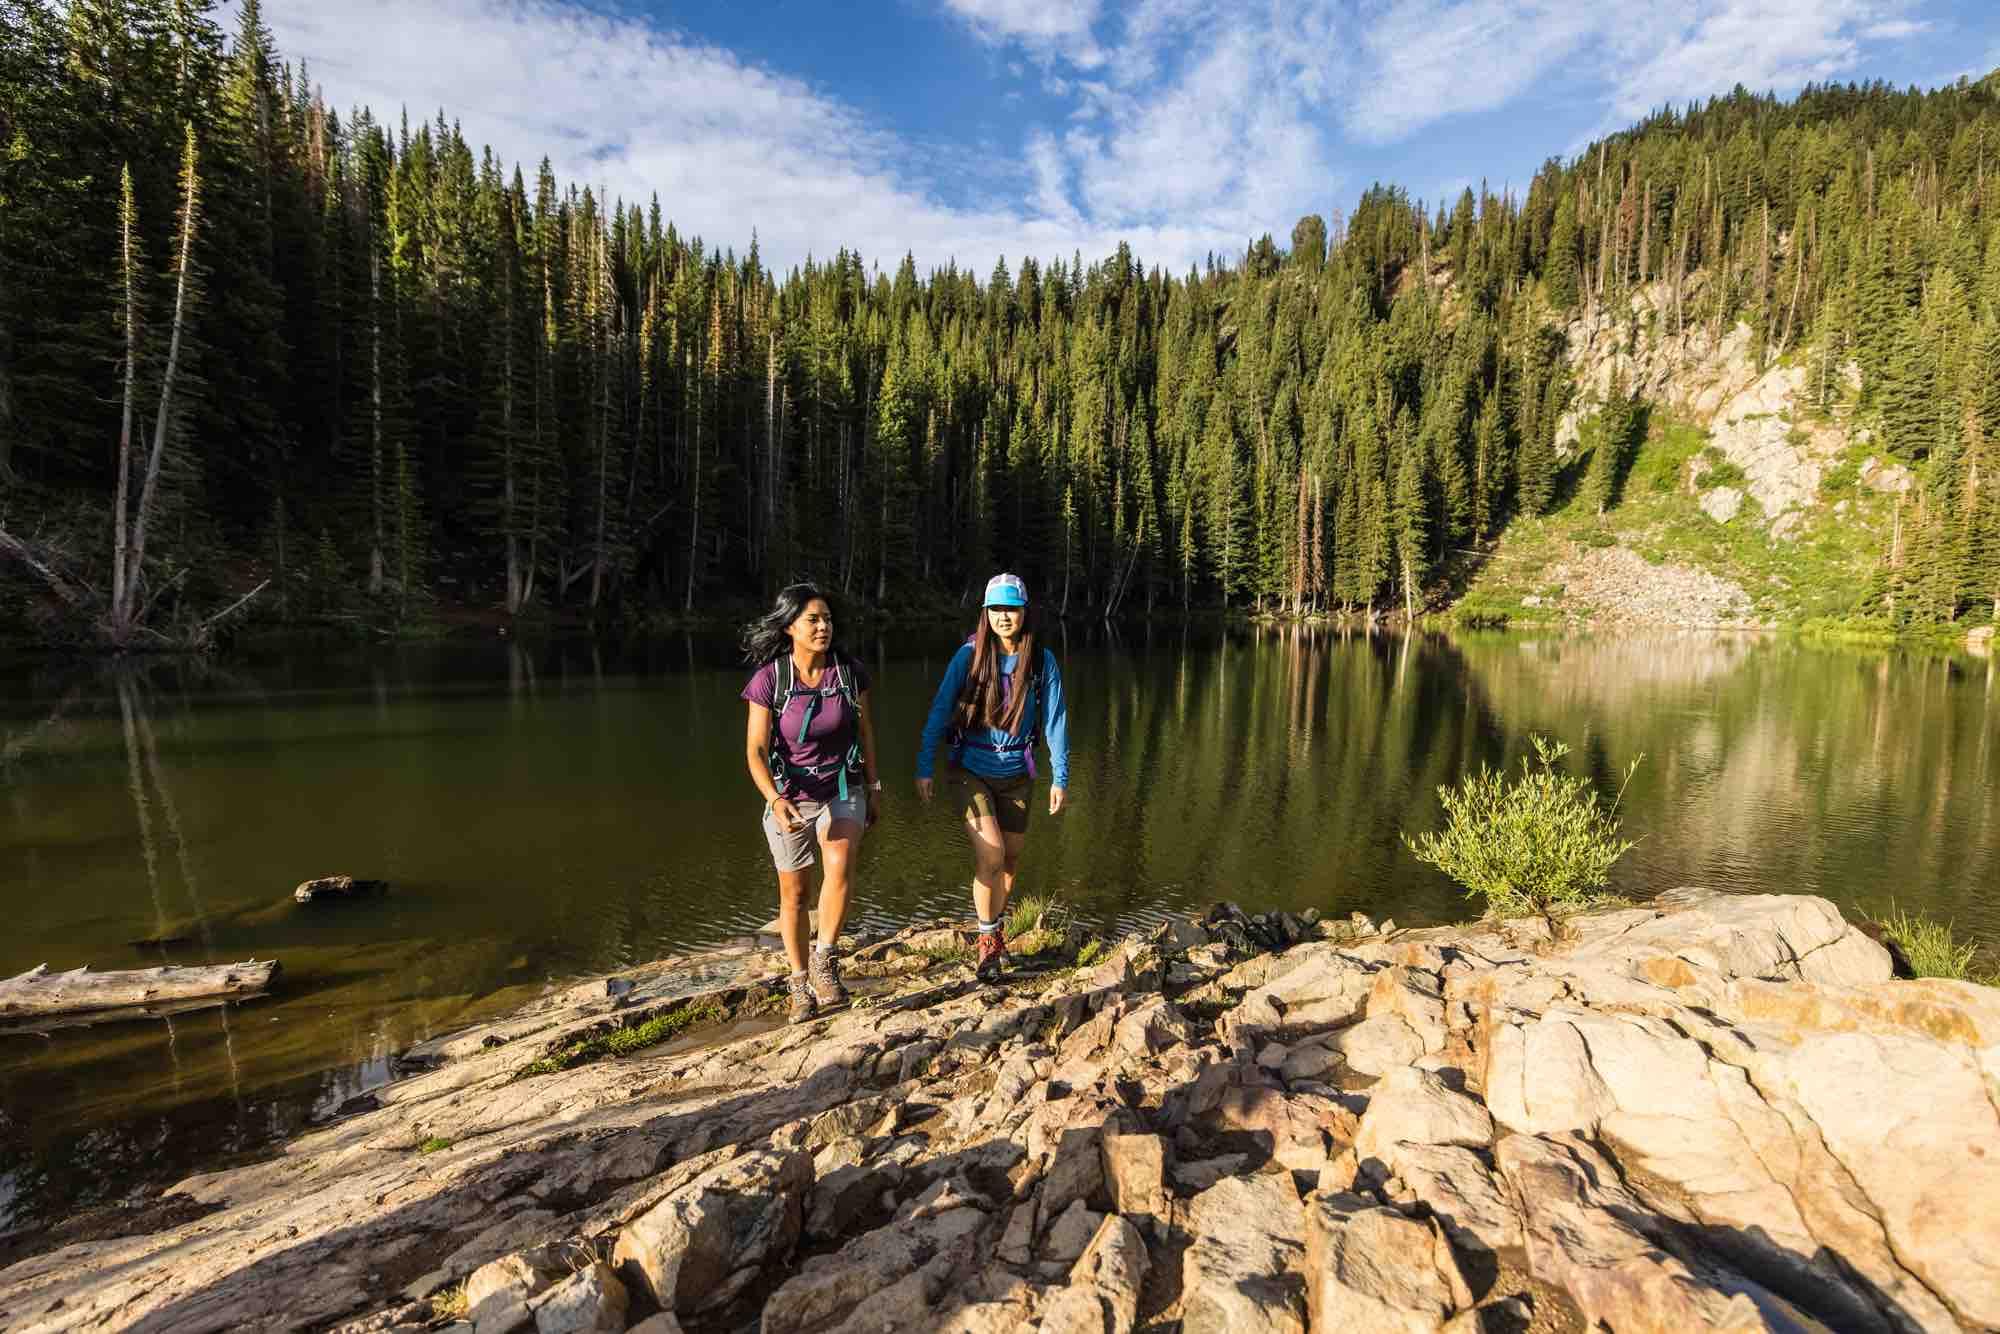 17 Reasons Women Over 50 Should Hike